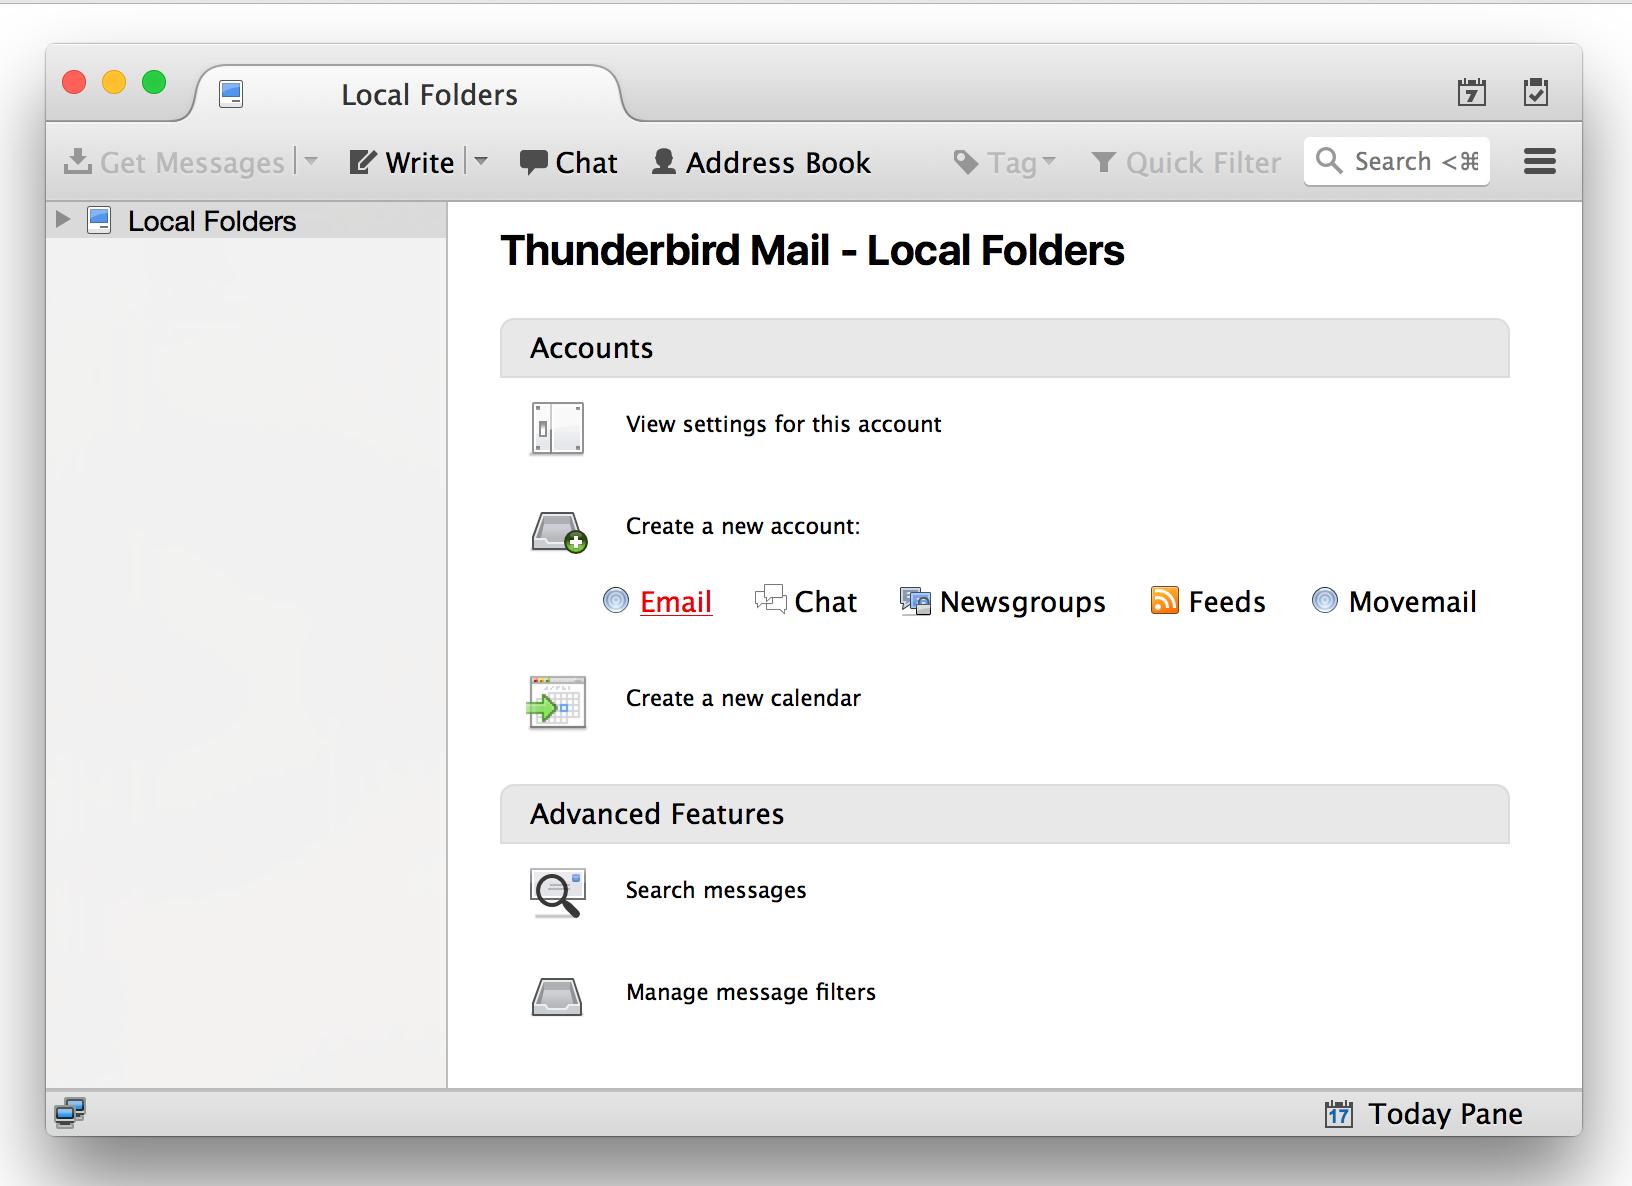 OAuth-авторизация в Mozilla Thunderbird: от зарождения до релиза - 6